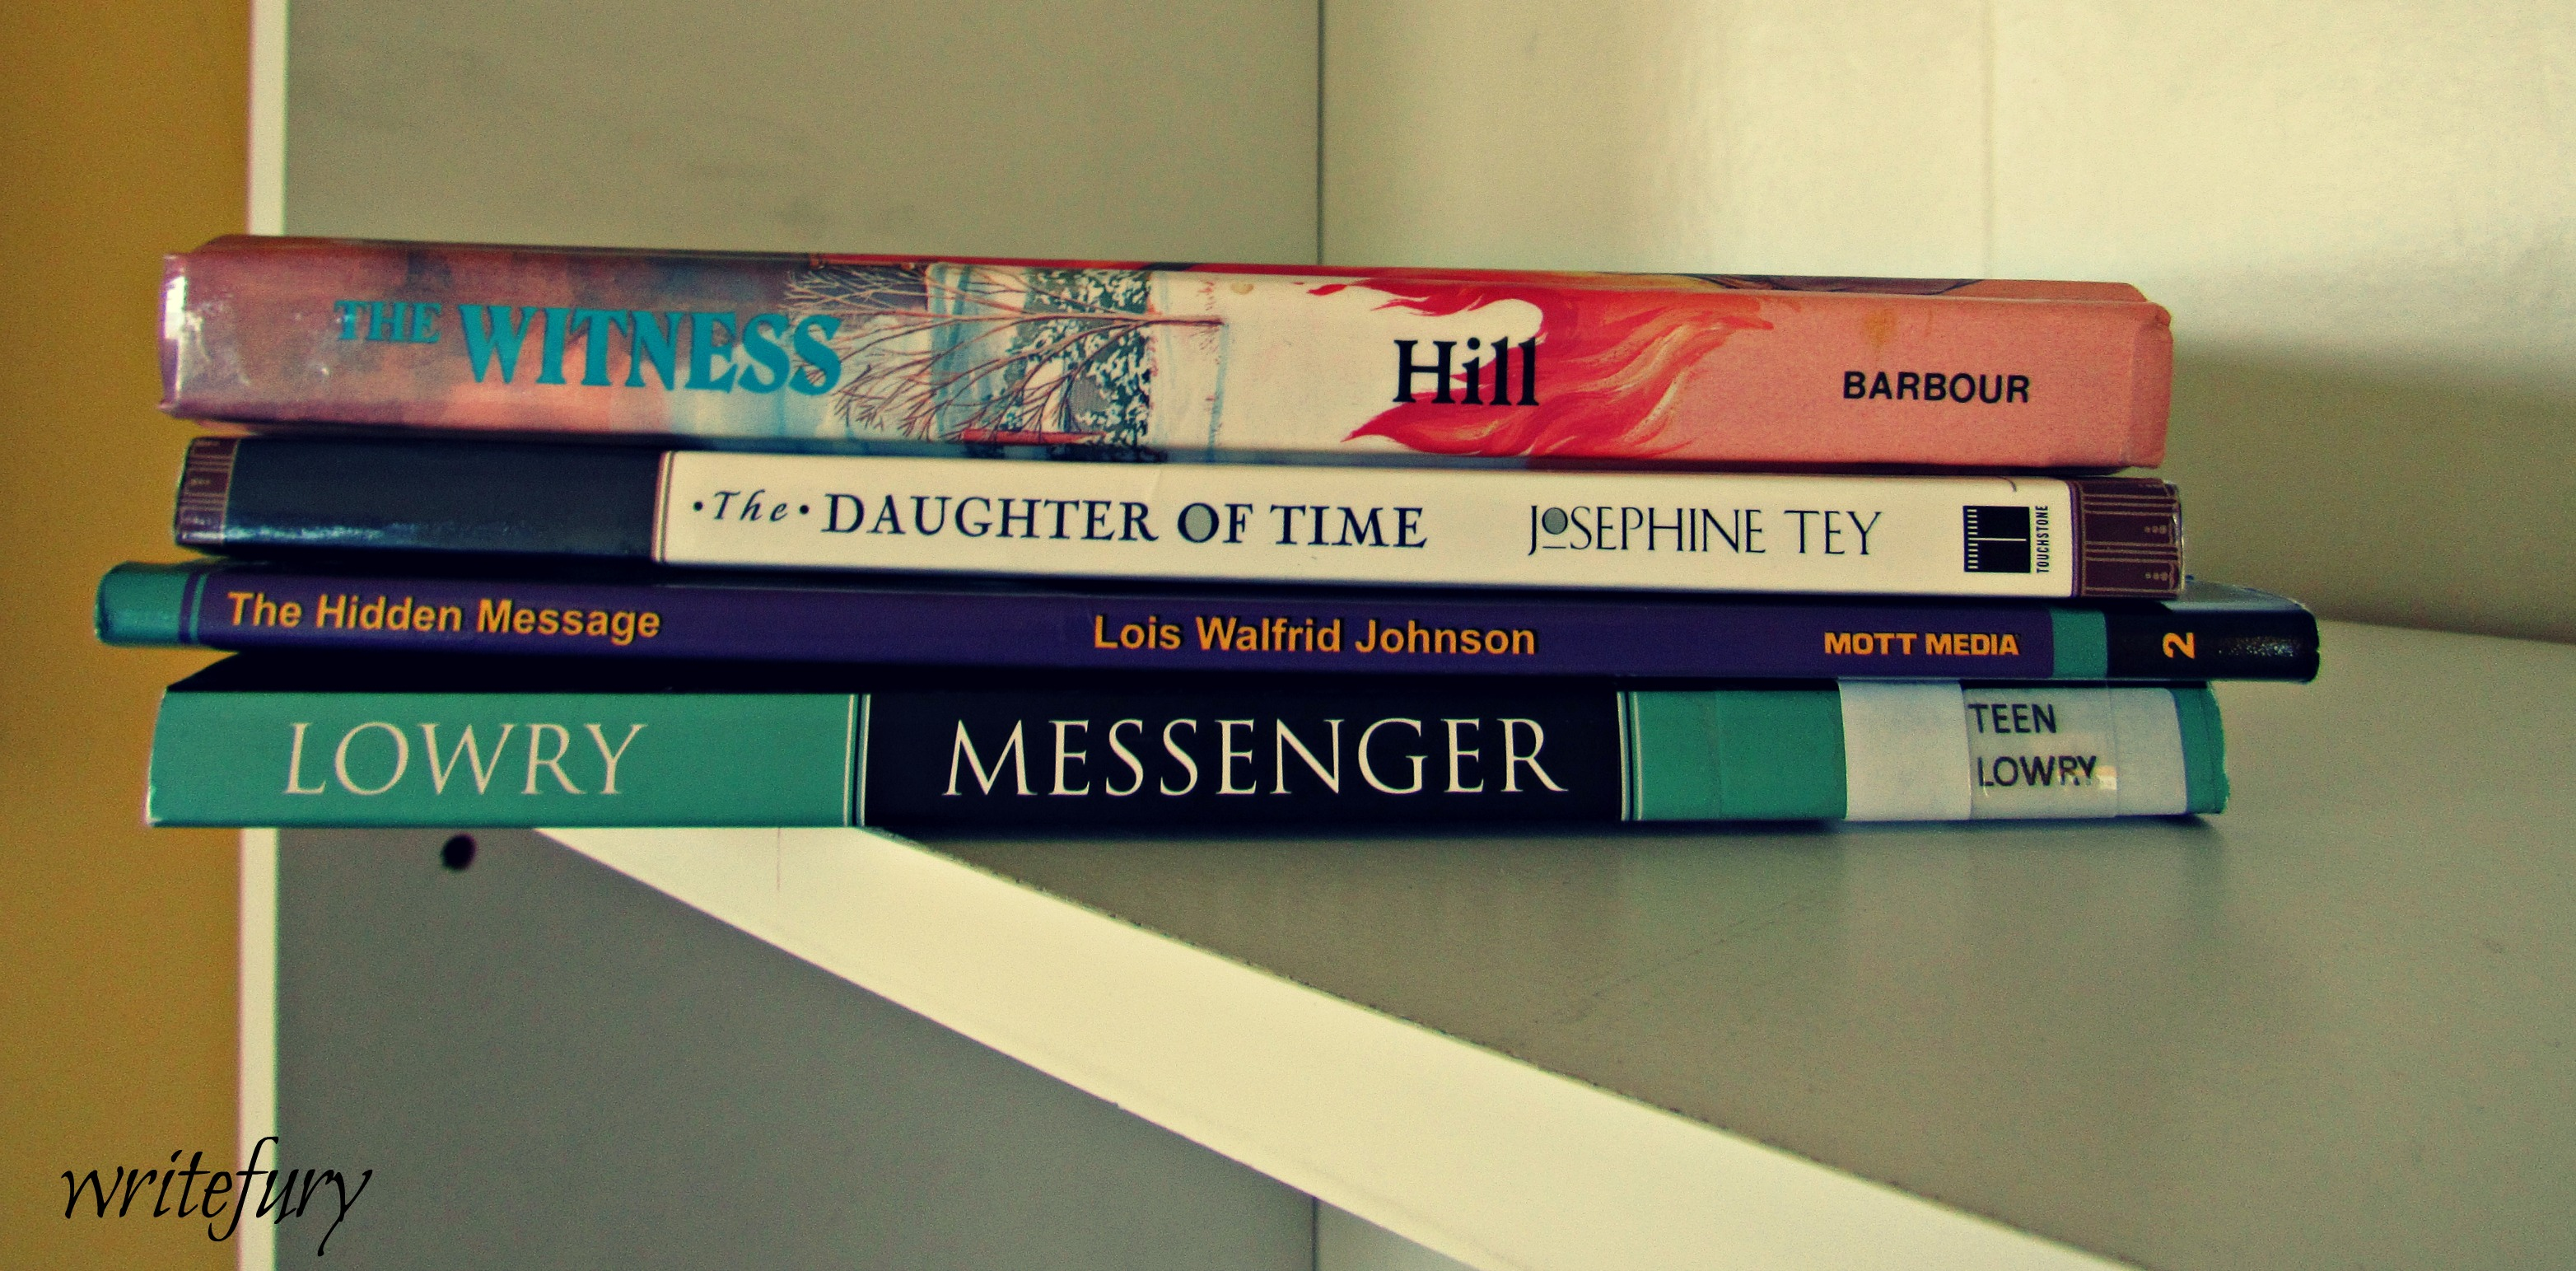 bookspine 4